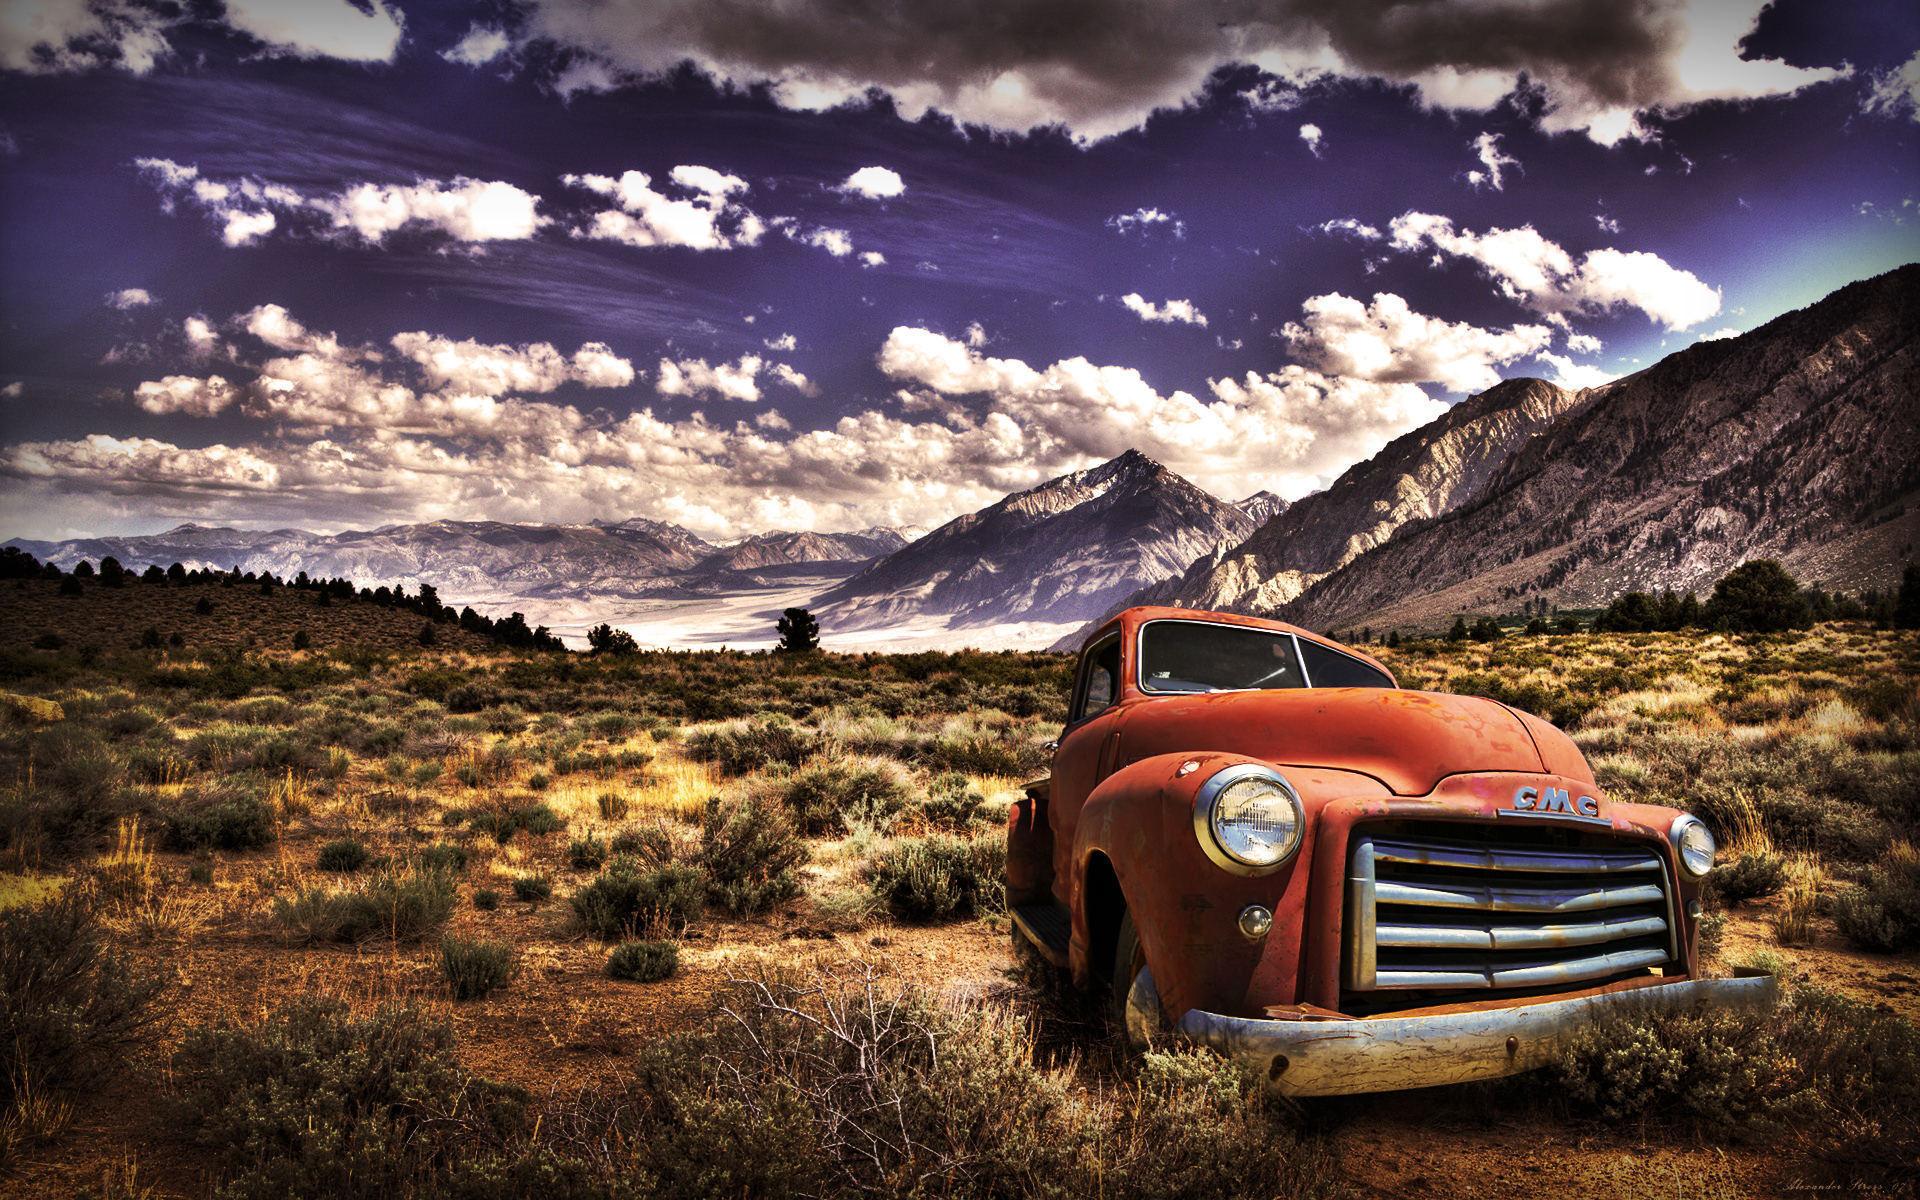 Auto Mountains Golf Cars Obloka Pickup Sky Clouds Retro